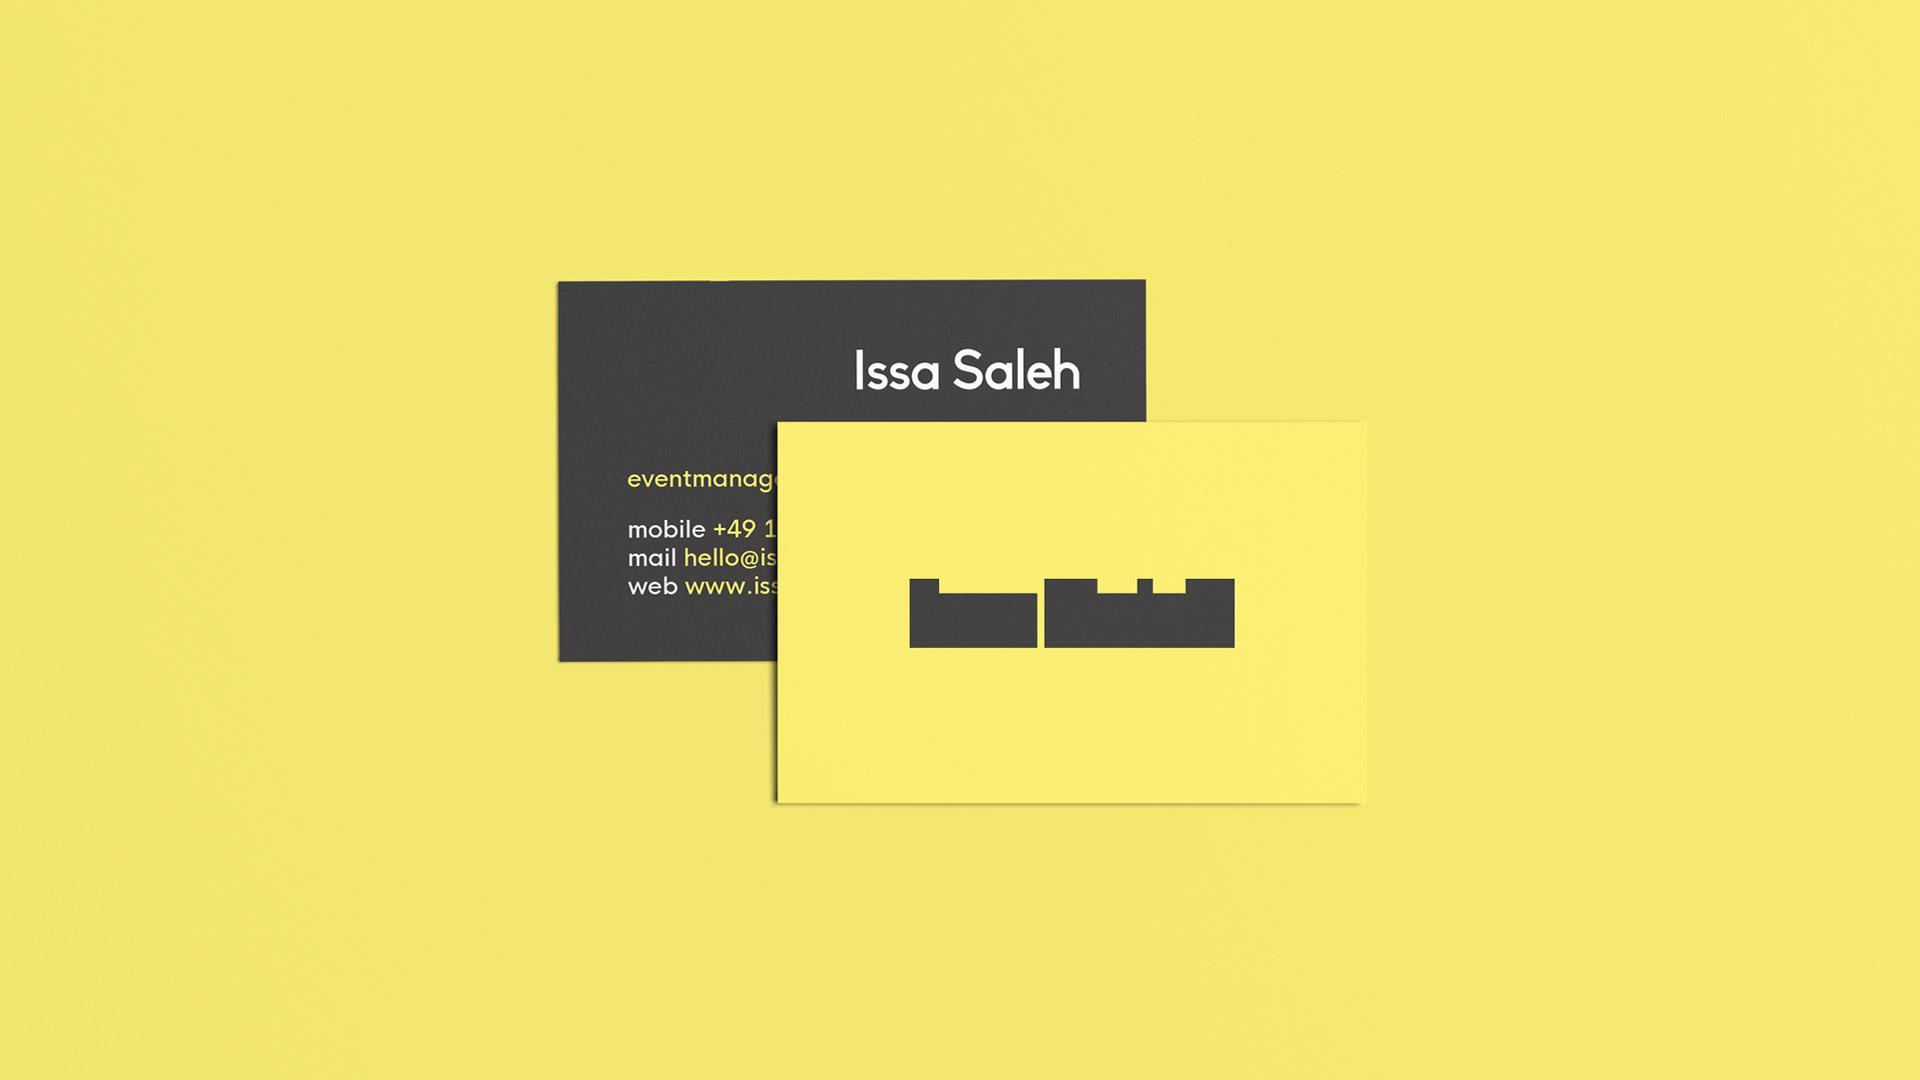 Issa Saleh